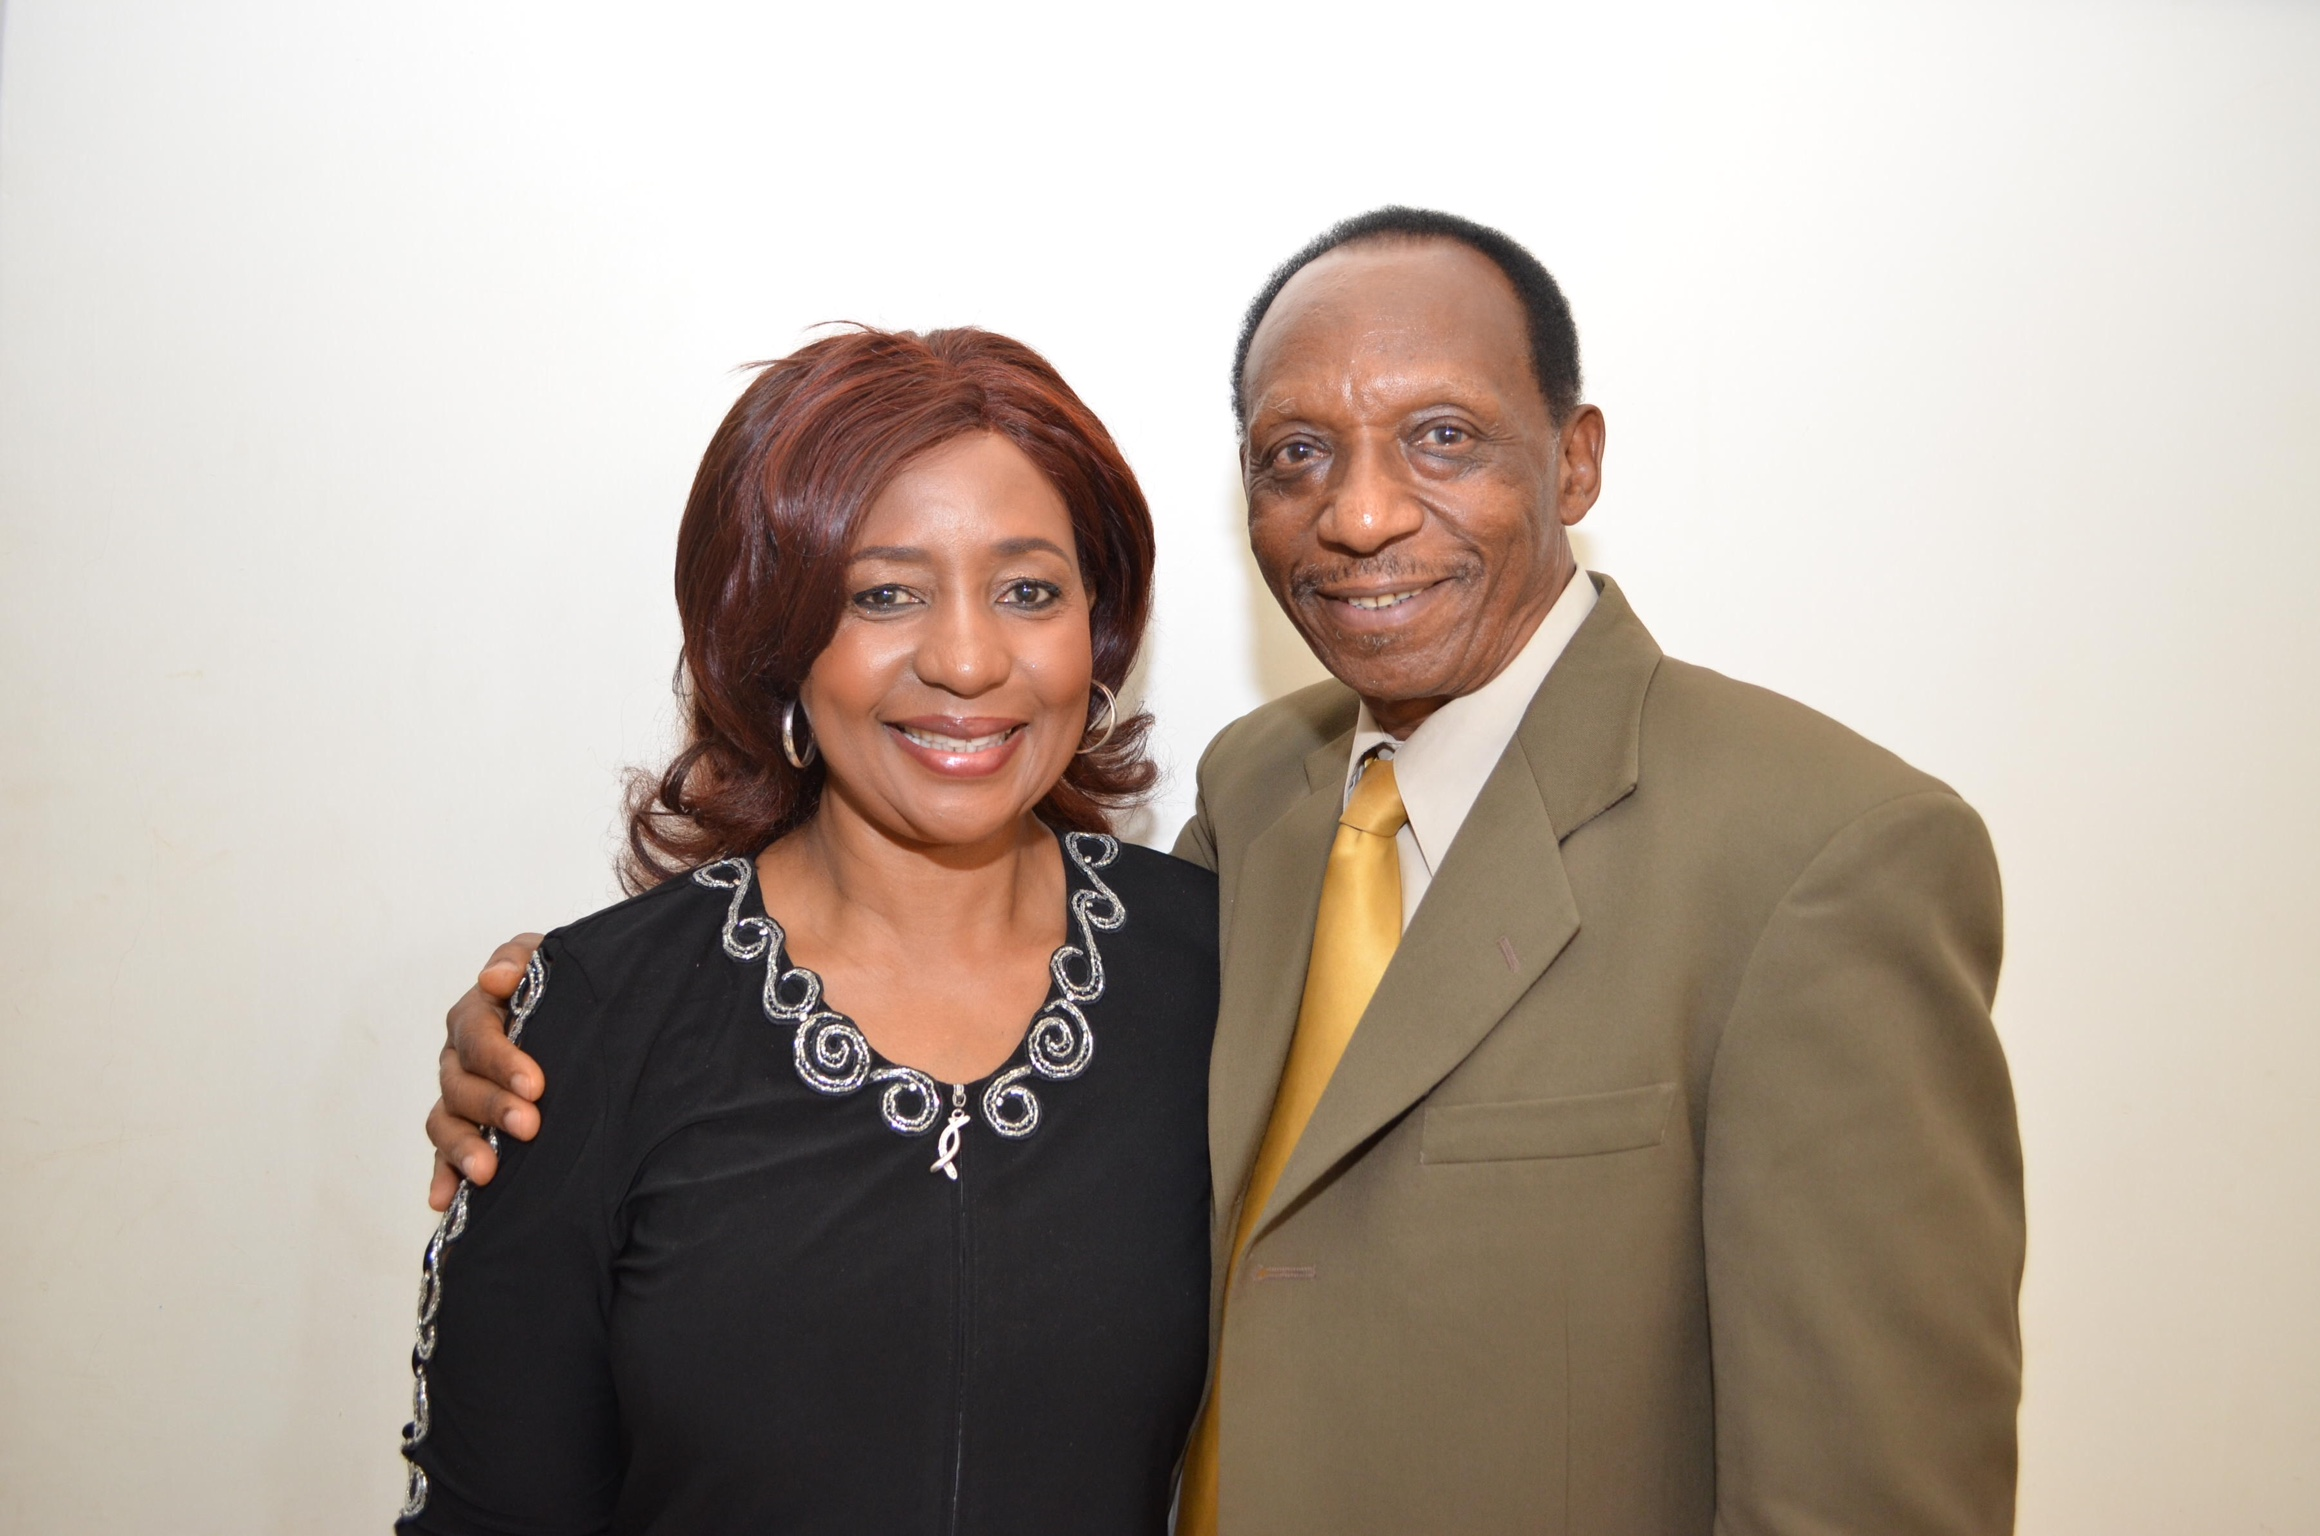 Victor and Eunice Mwangi